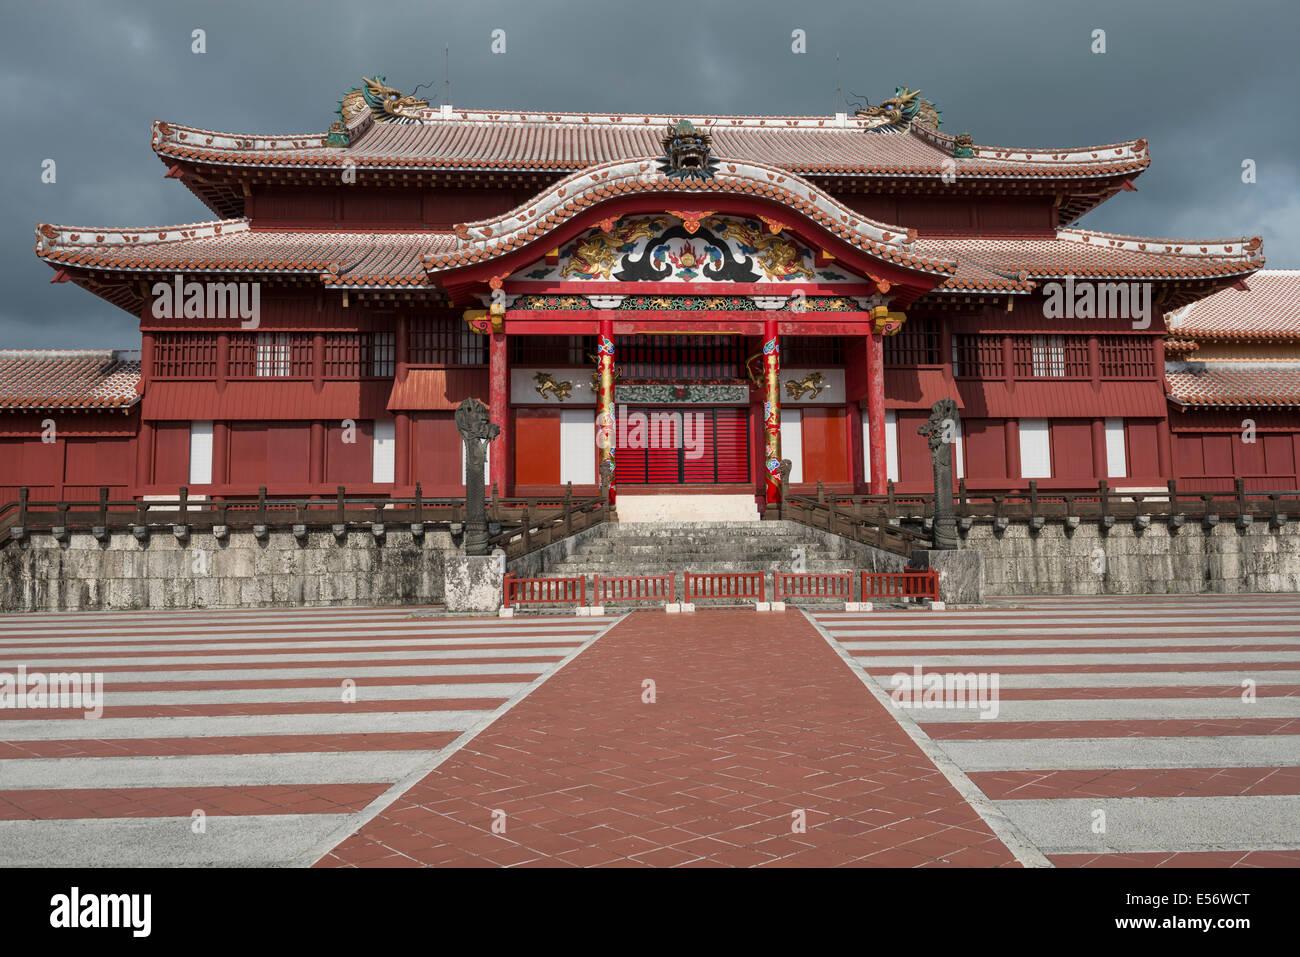 Shuri Castle near Naha, Okinawa, Japan - Stock Image